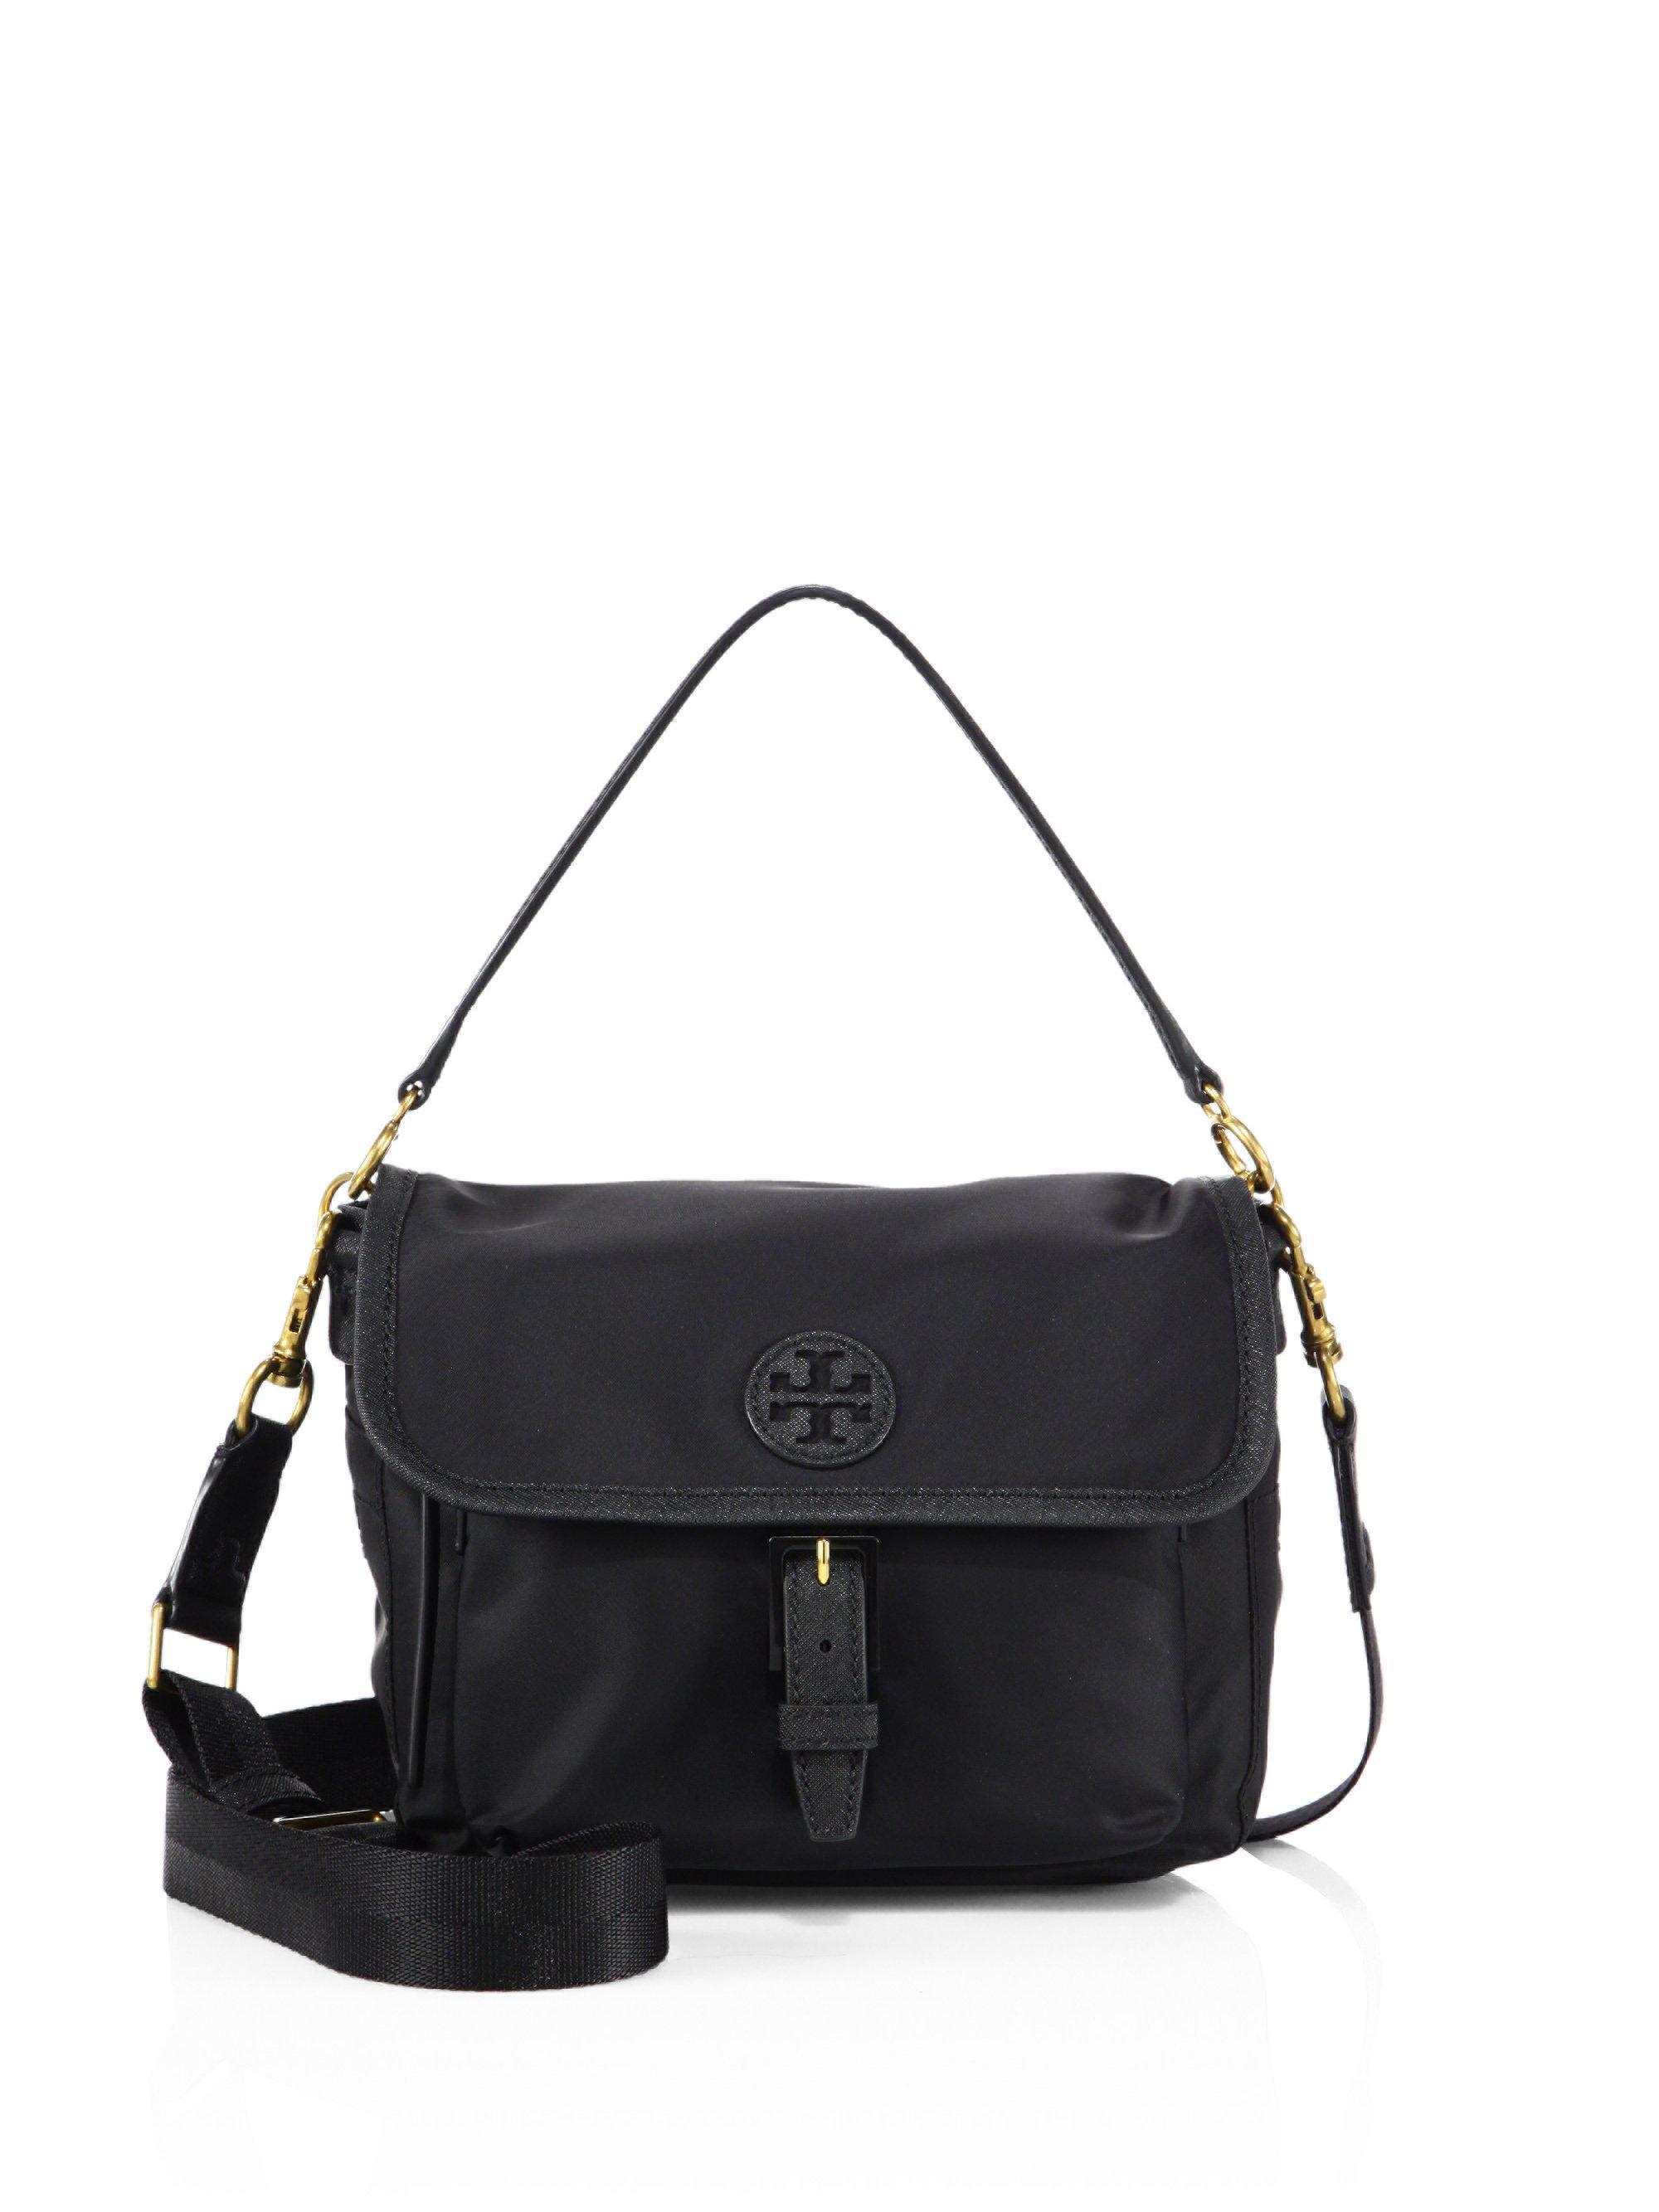 03475b8c8665d Lyst - Tory Burch Scout Nylon Crossbody Bag in Black